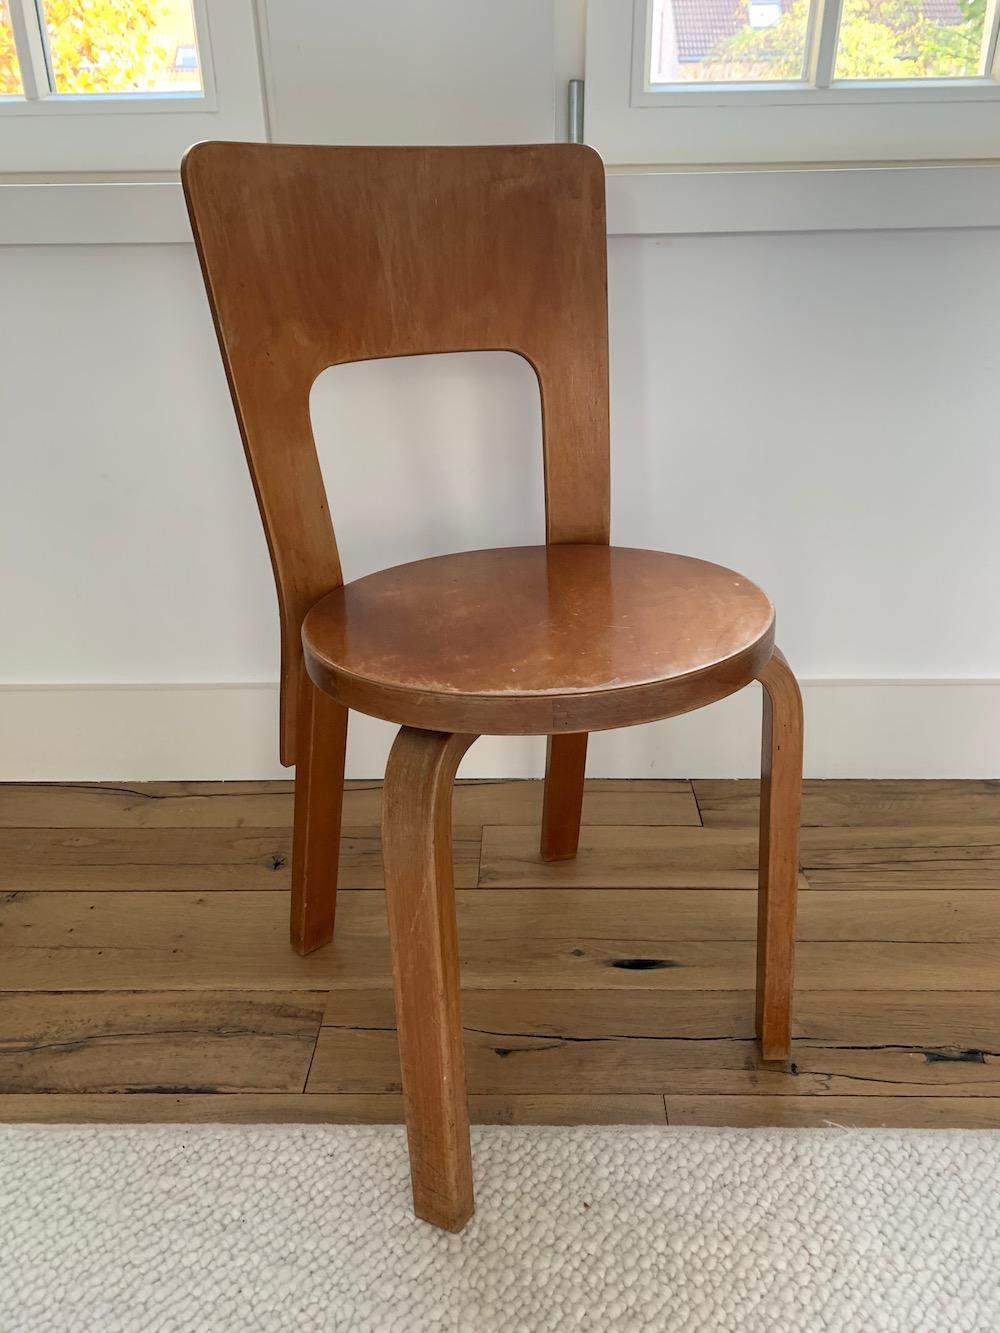 Alvar Aalto, vintage chair, chaise vintage, mobilier vintage,midmod, midcenturymodern, vintage design, vintage, dining, dining chair, chaises à diner, chaises cuisine, kitchen, desk chair, charming chair, midmodfurniture, Finnish design, European design, Scandinavian design, design scandinave, chaise bois, wooden chair, iconic piece, iconic design, Artek, chair 66